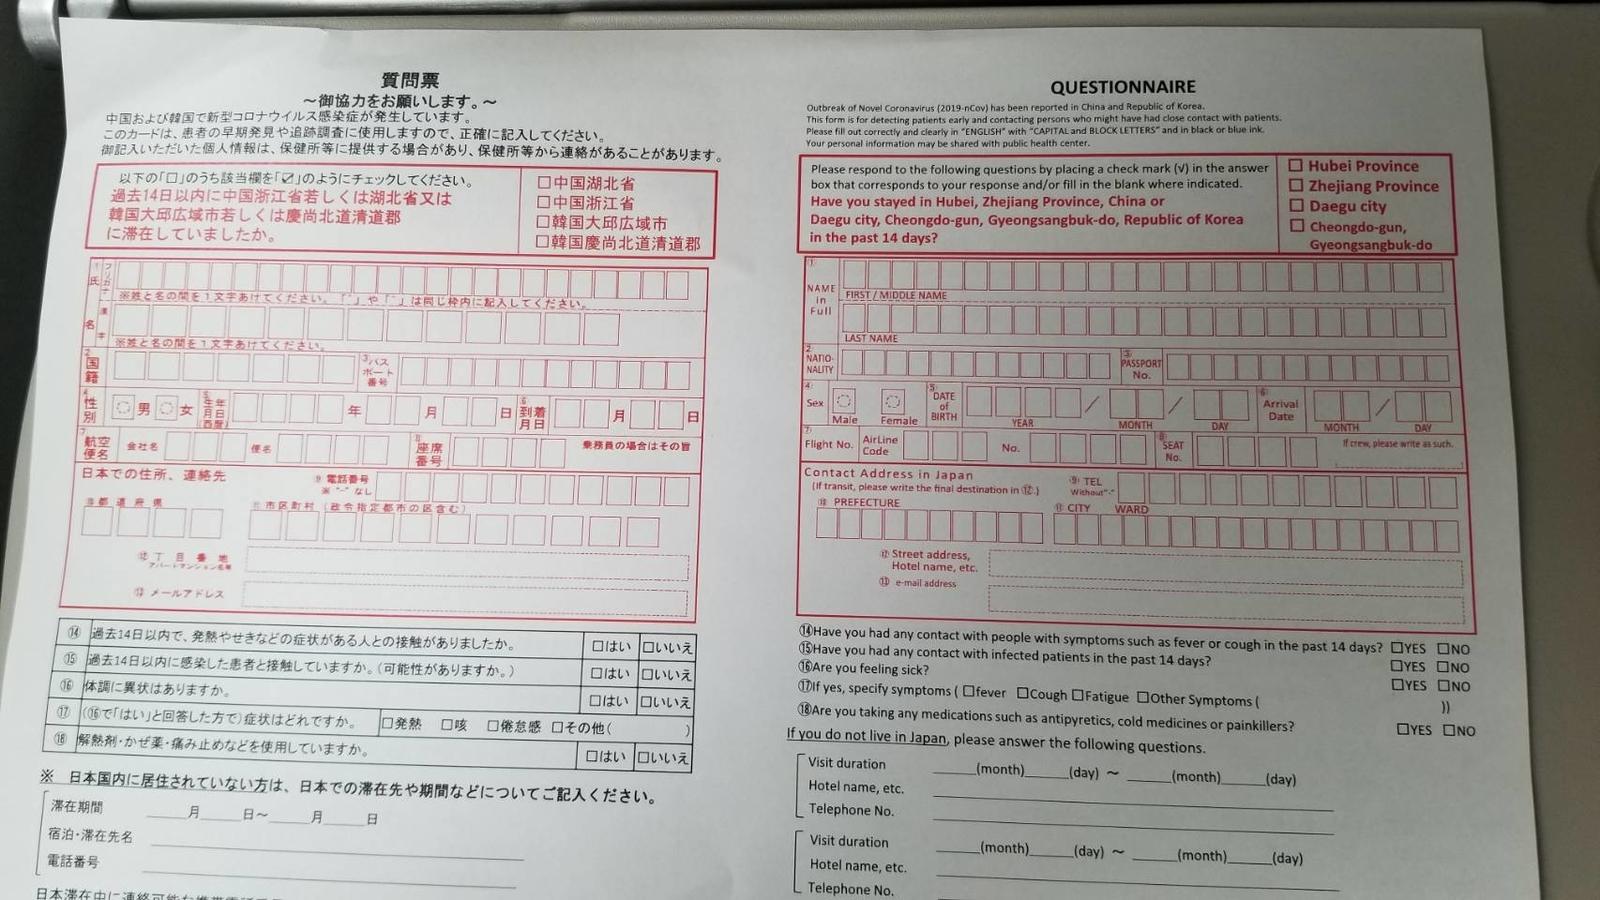 f:id:sunchan33:20200302011424j:plain